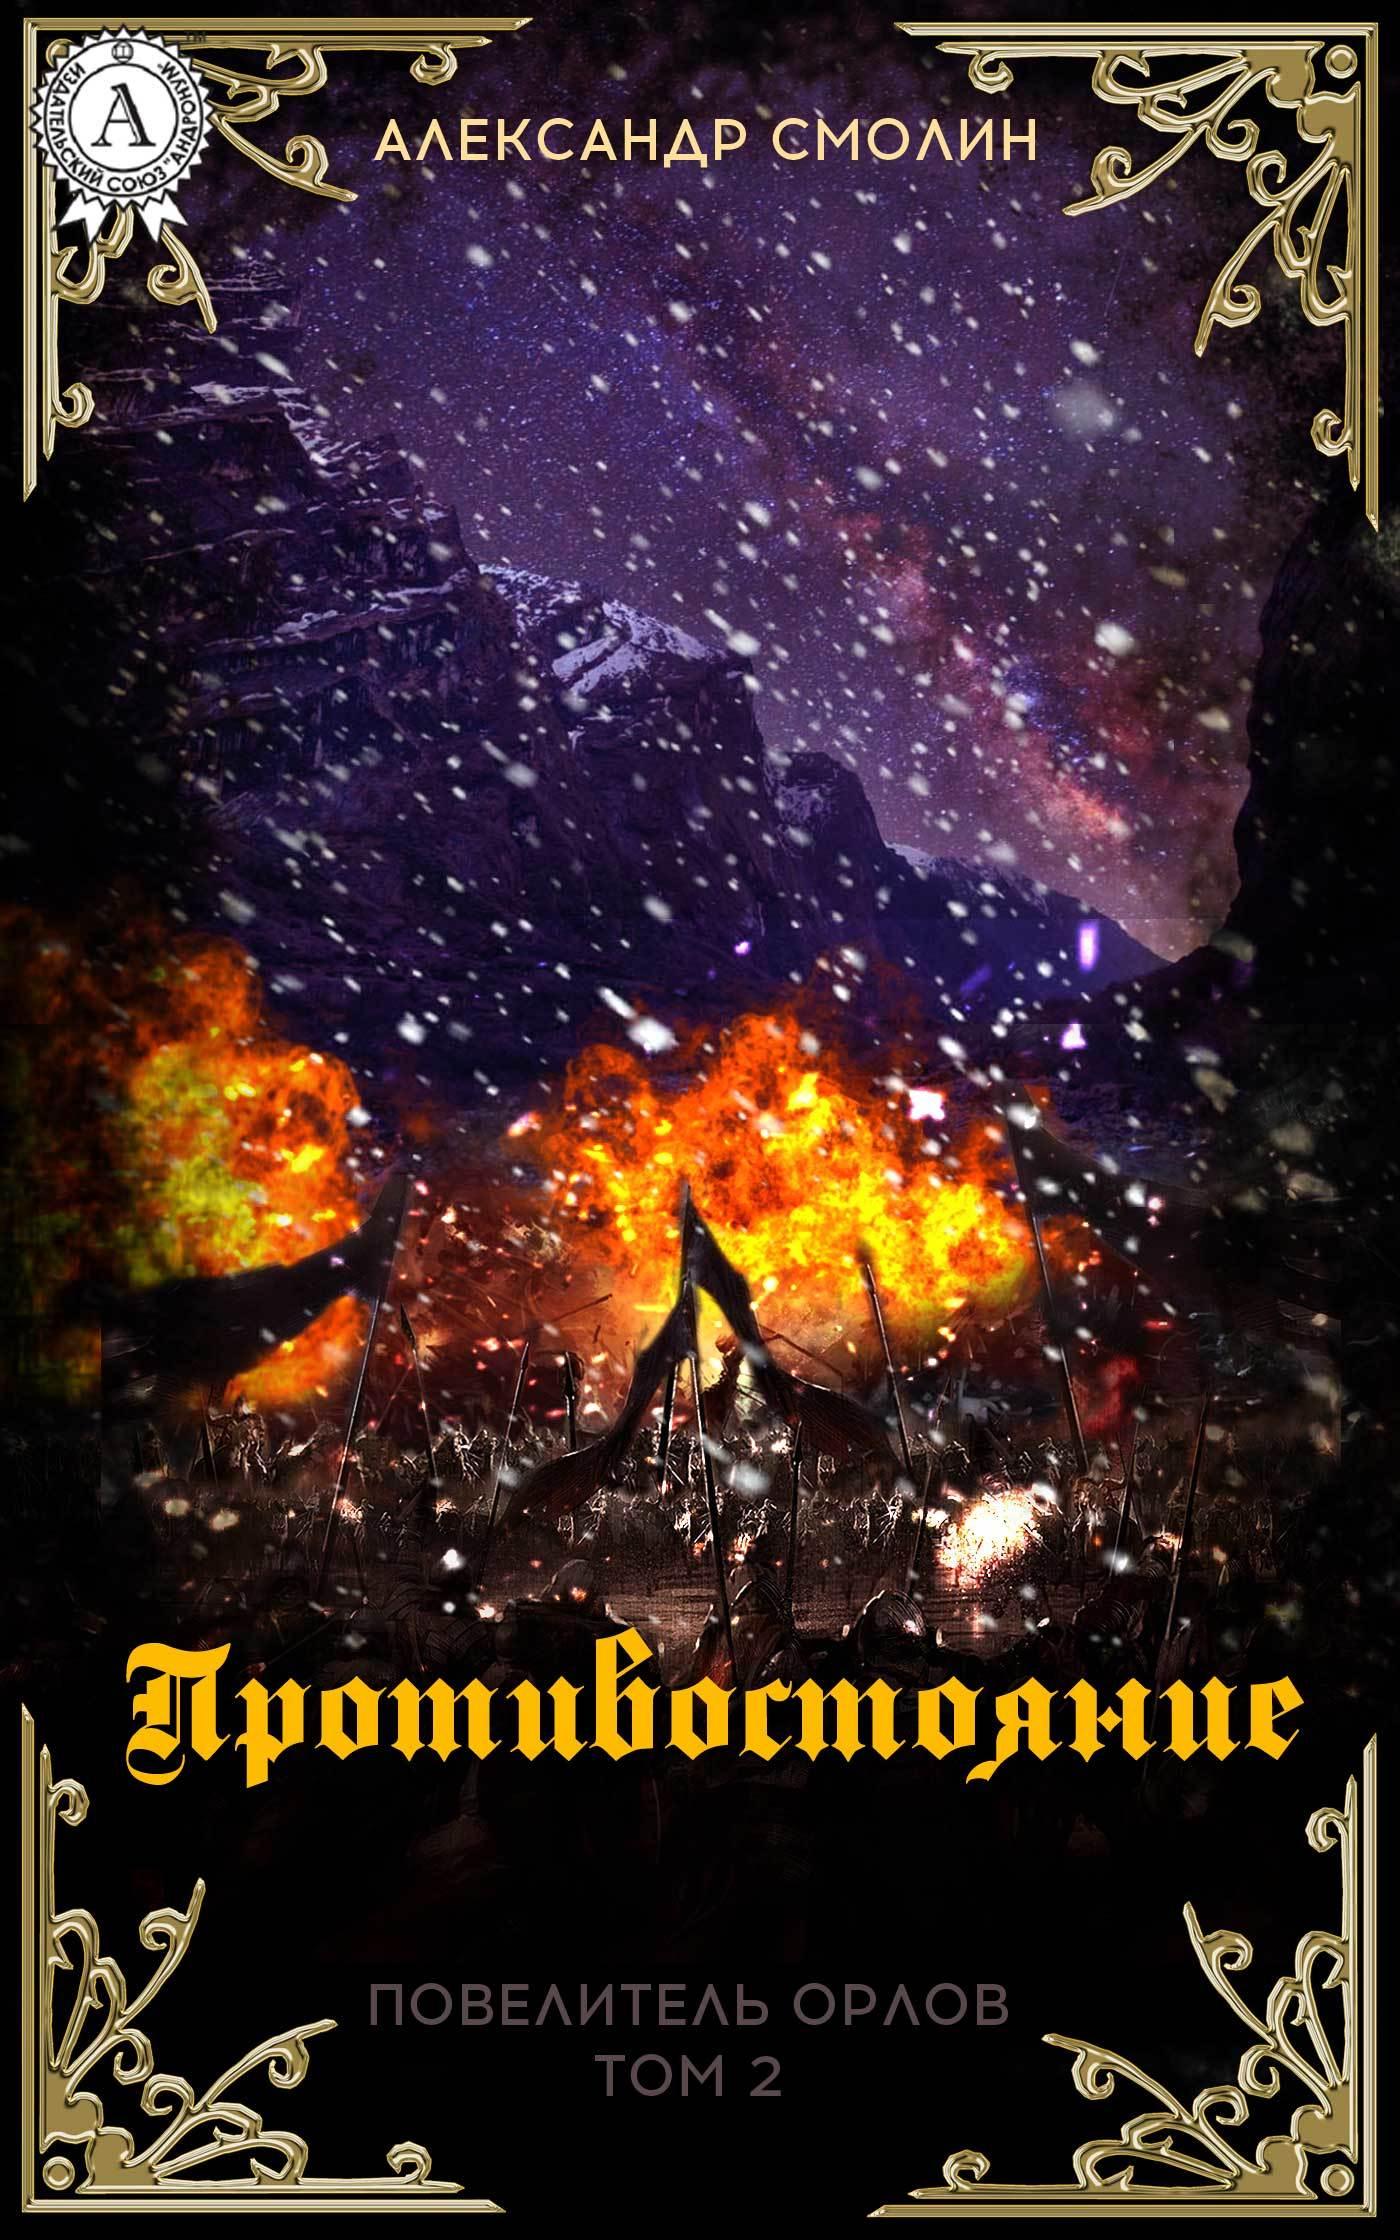 Александр Смолин - Противостояние